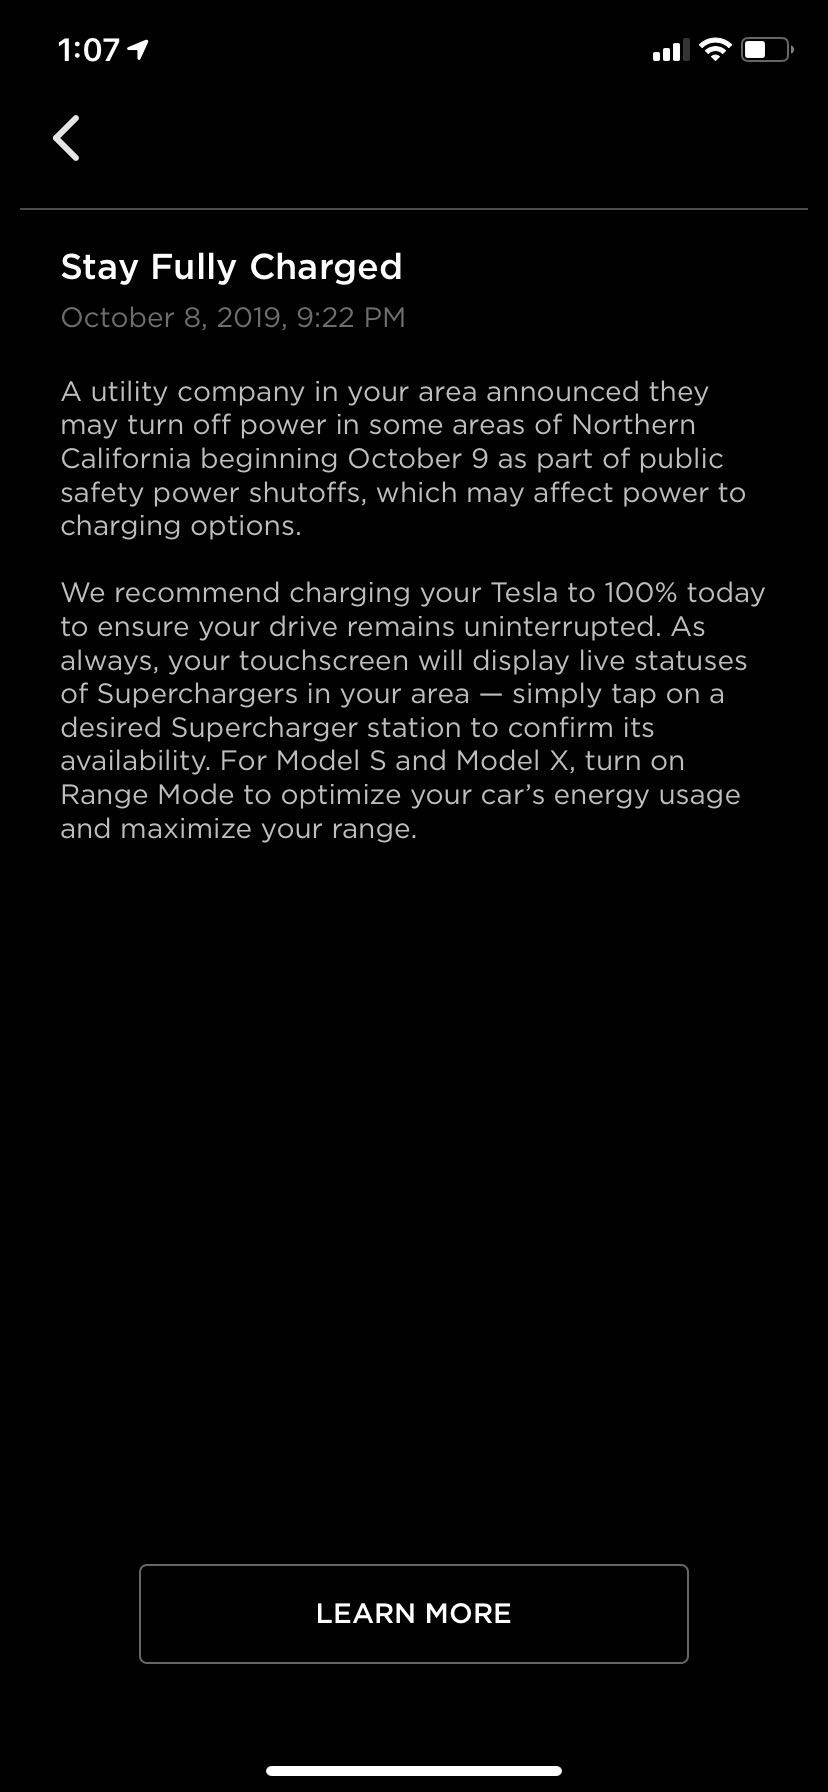 tesla-power-outage